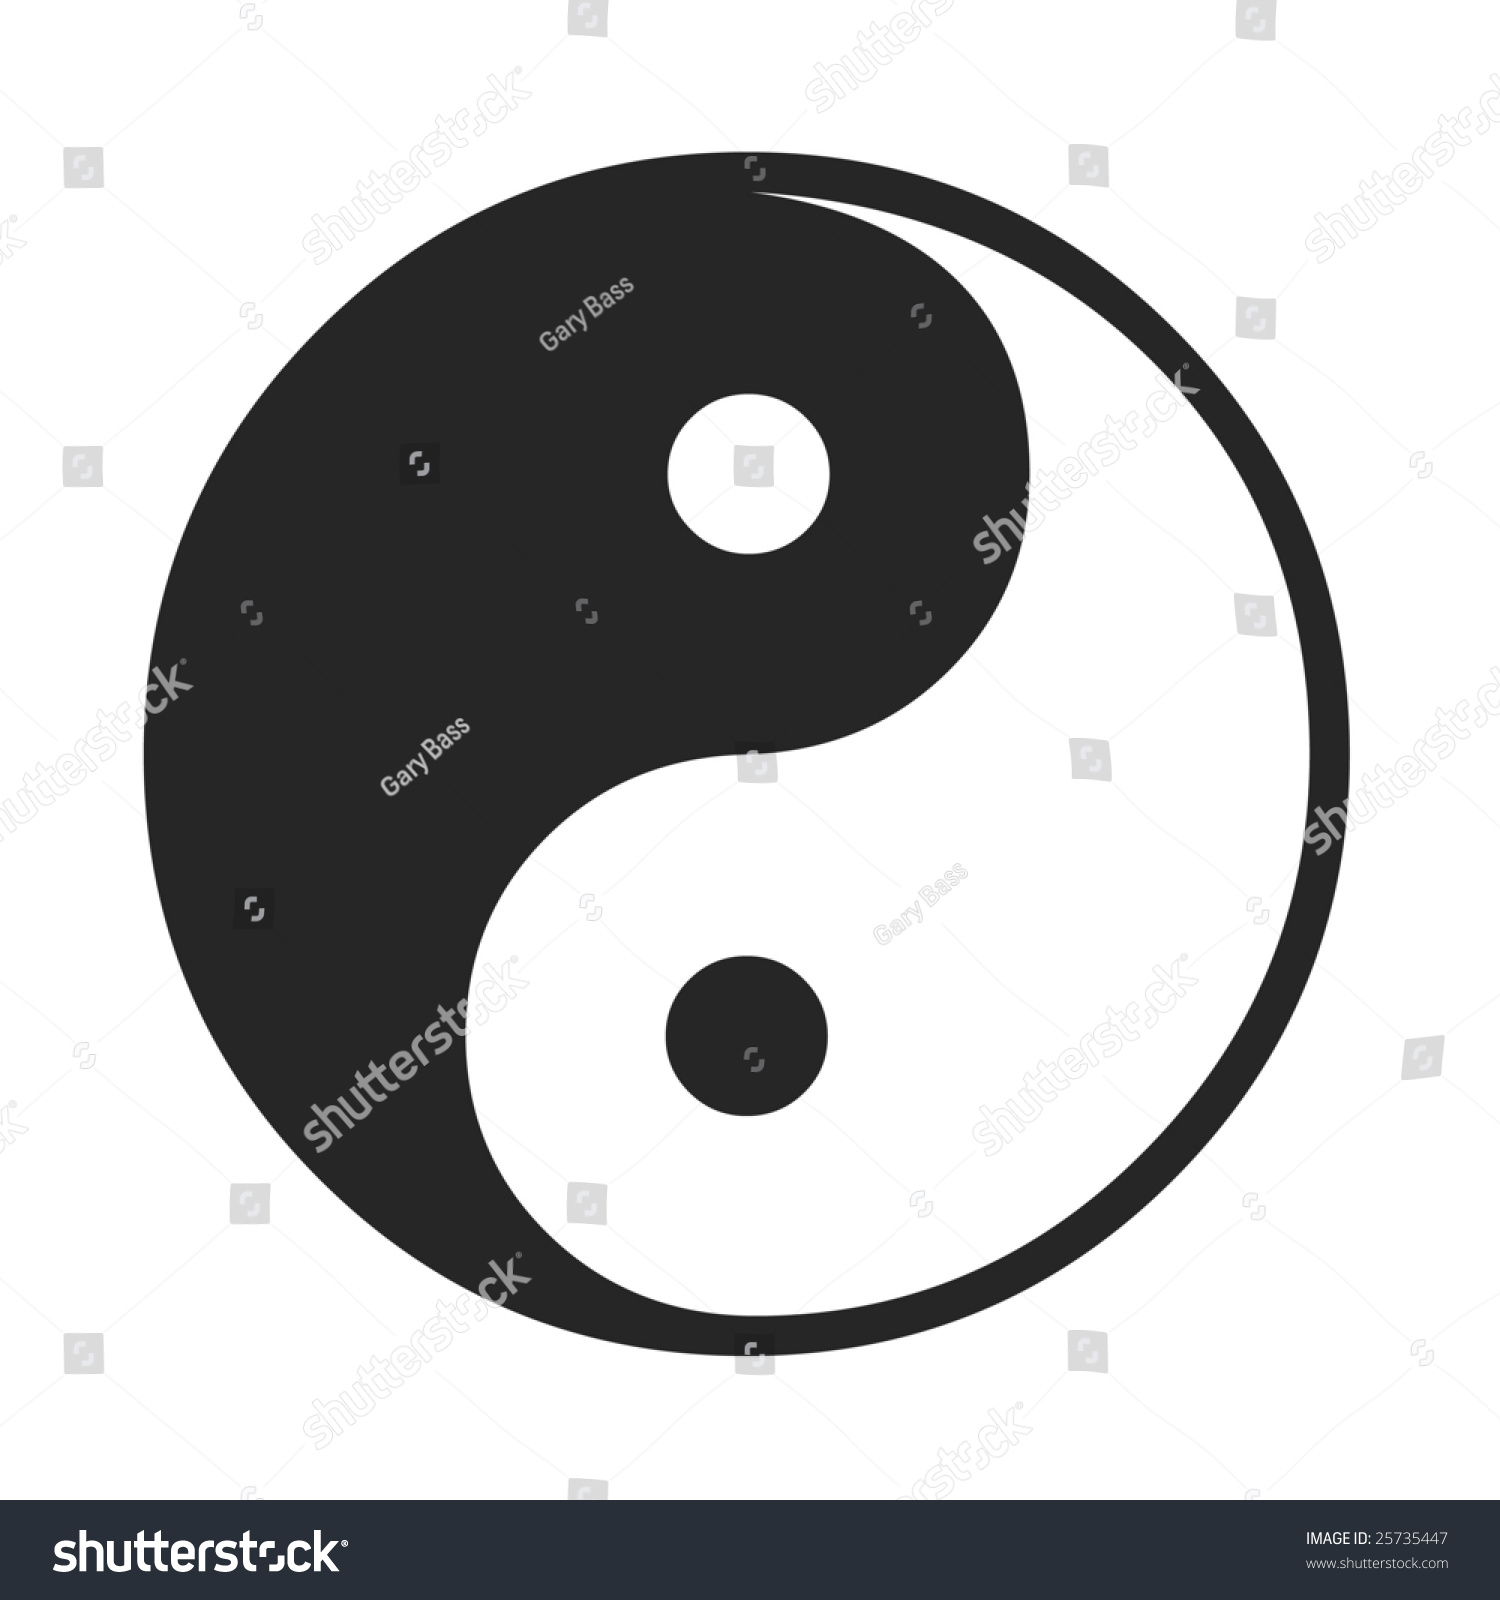 Chinese religious symbol stock illustration 25735447 shutterstock chinese religious symbol biocorpaavc Images